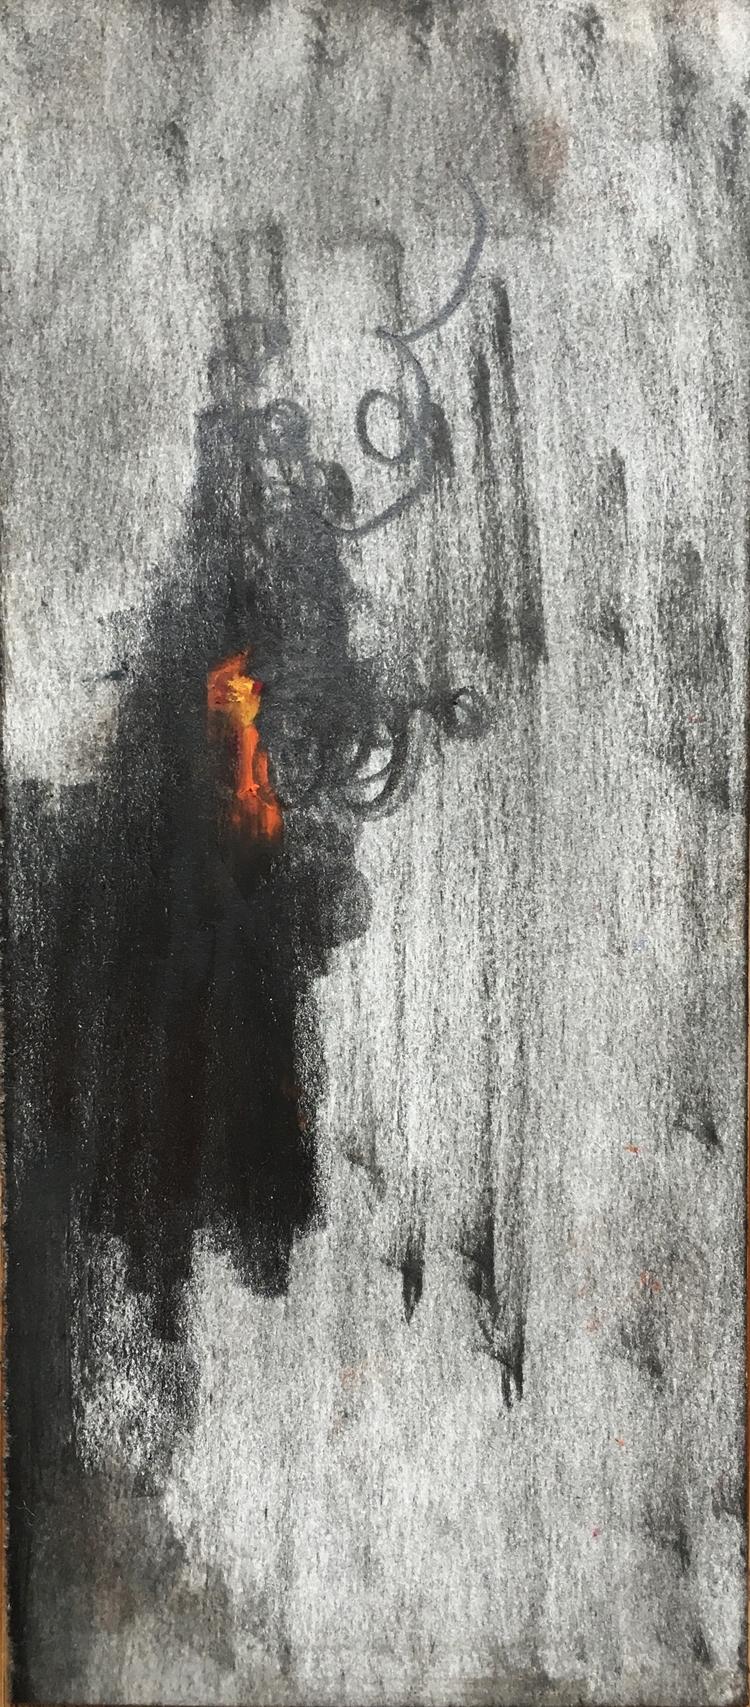 Small Fire - oilpastel - jasonjsnell | ello